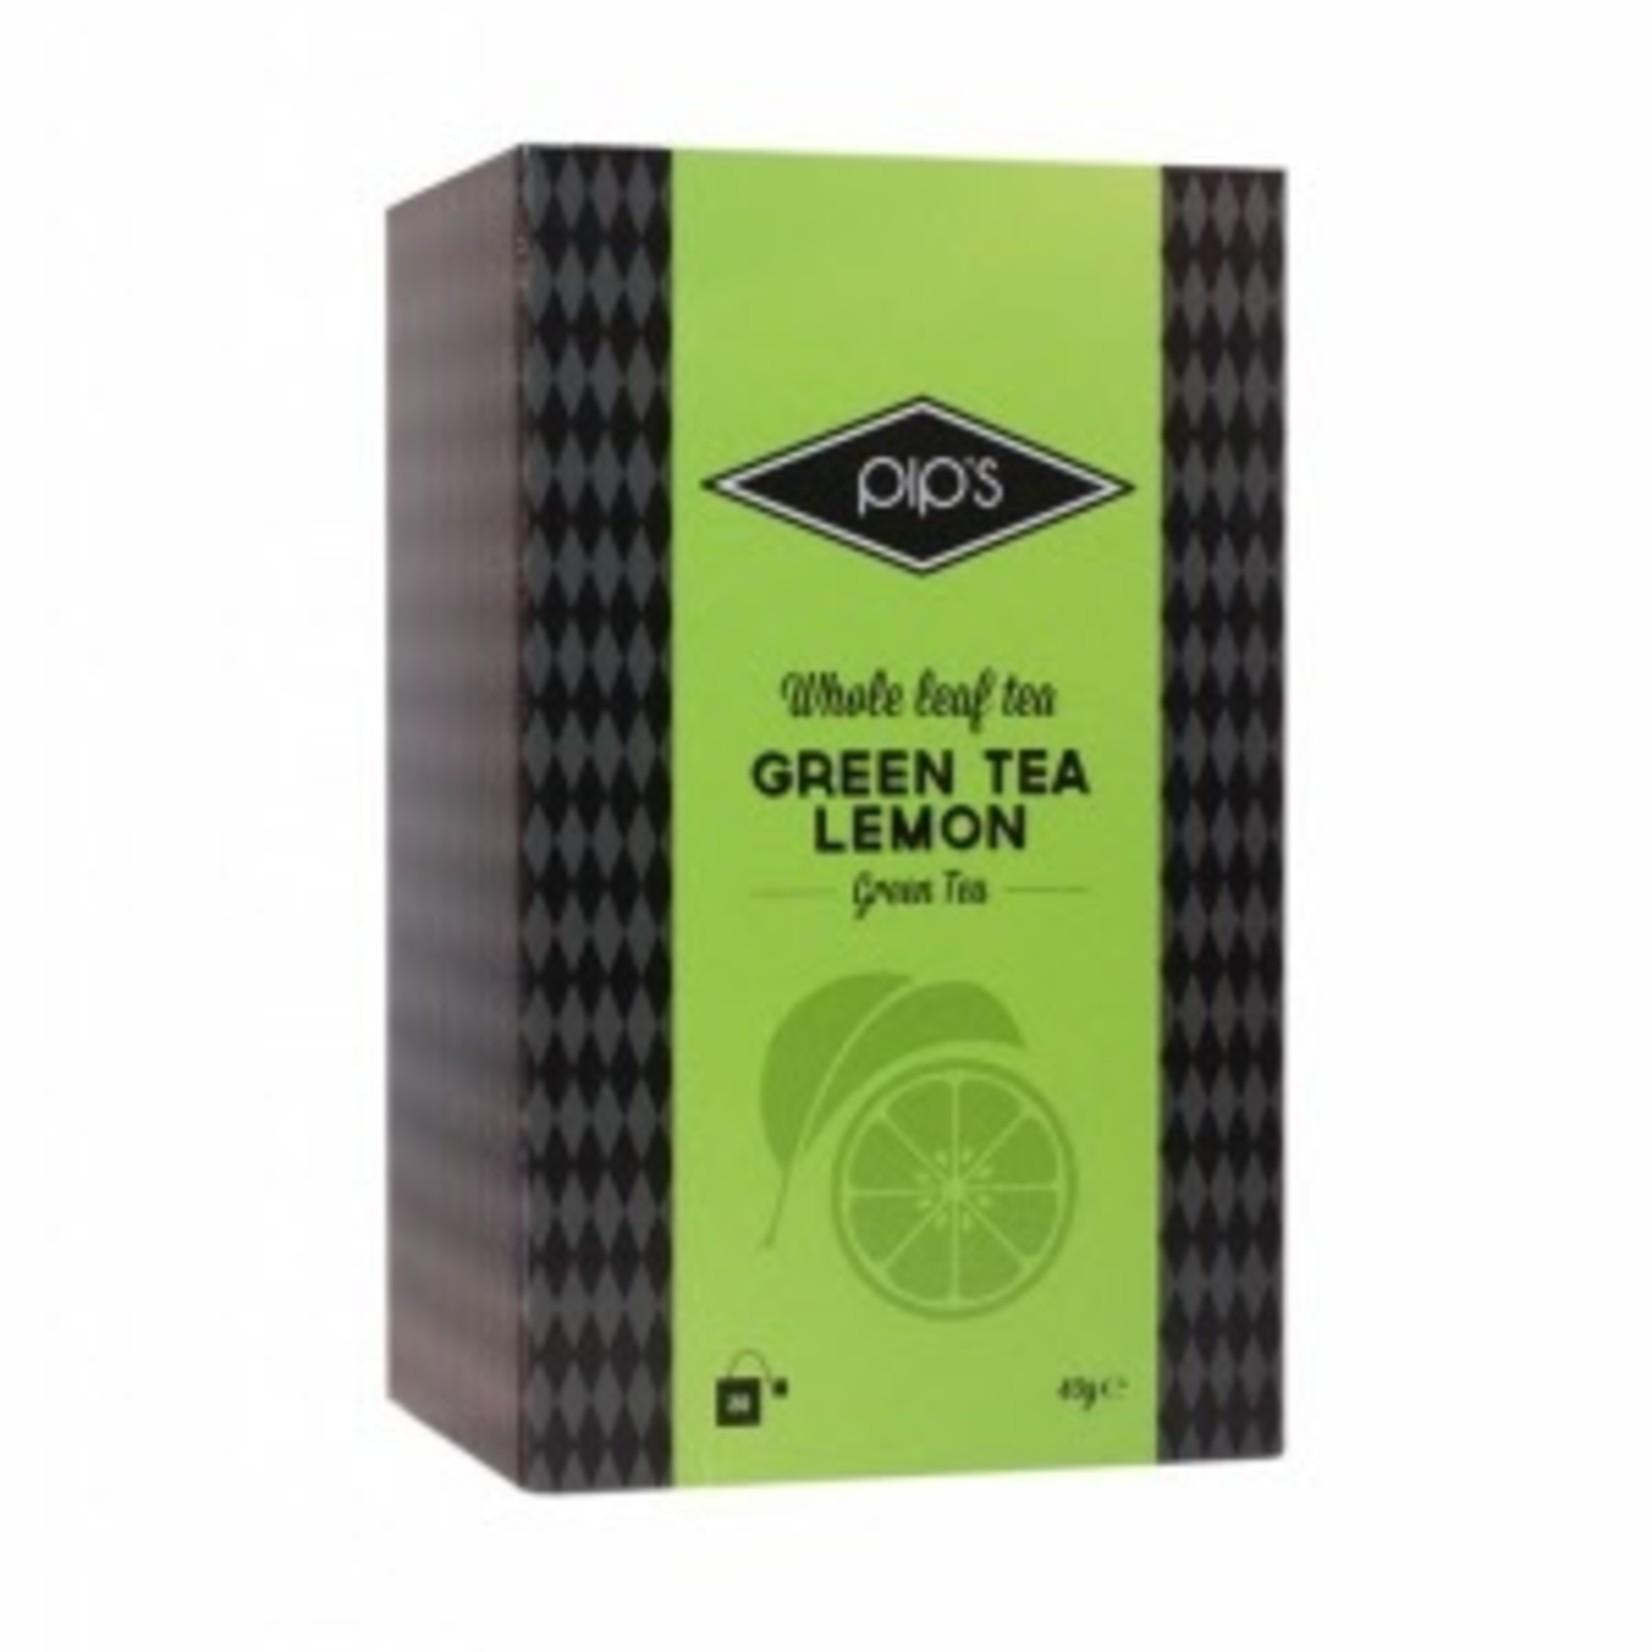 Pip's Thee Green Tea Lemon